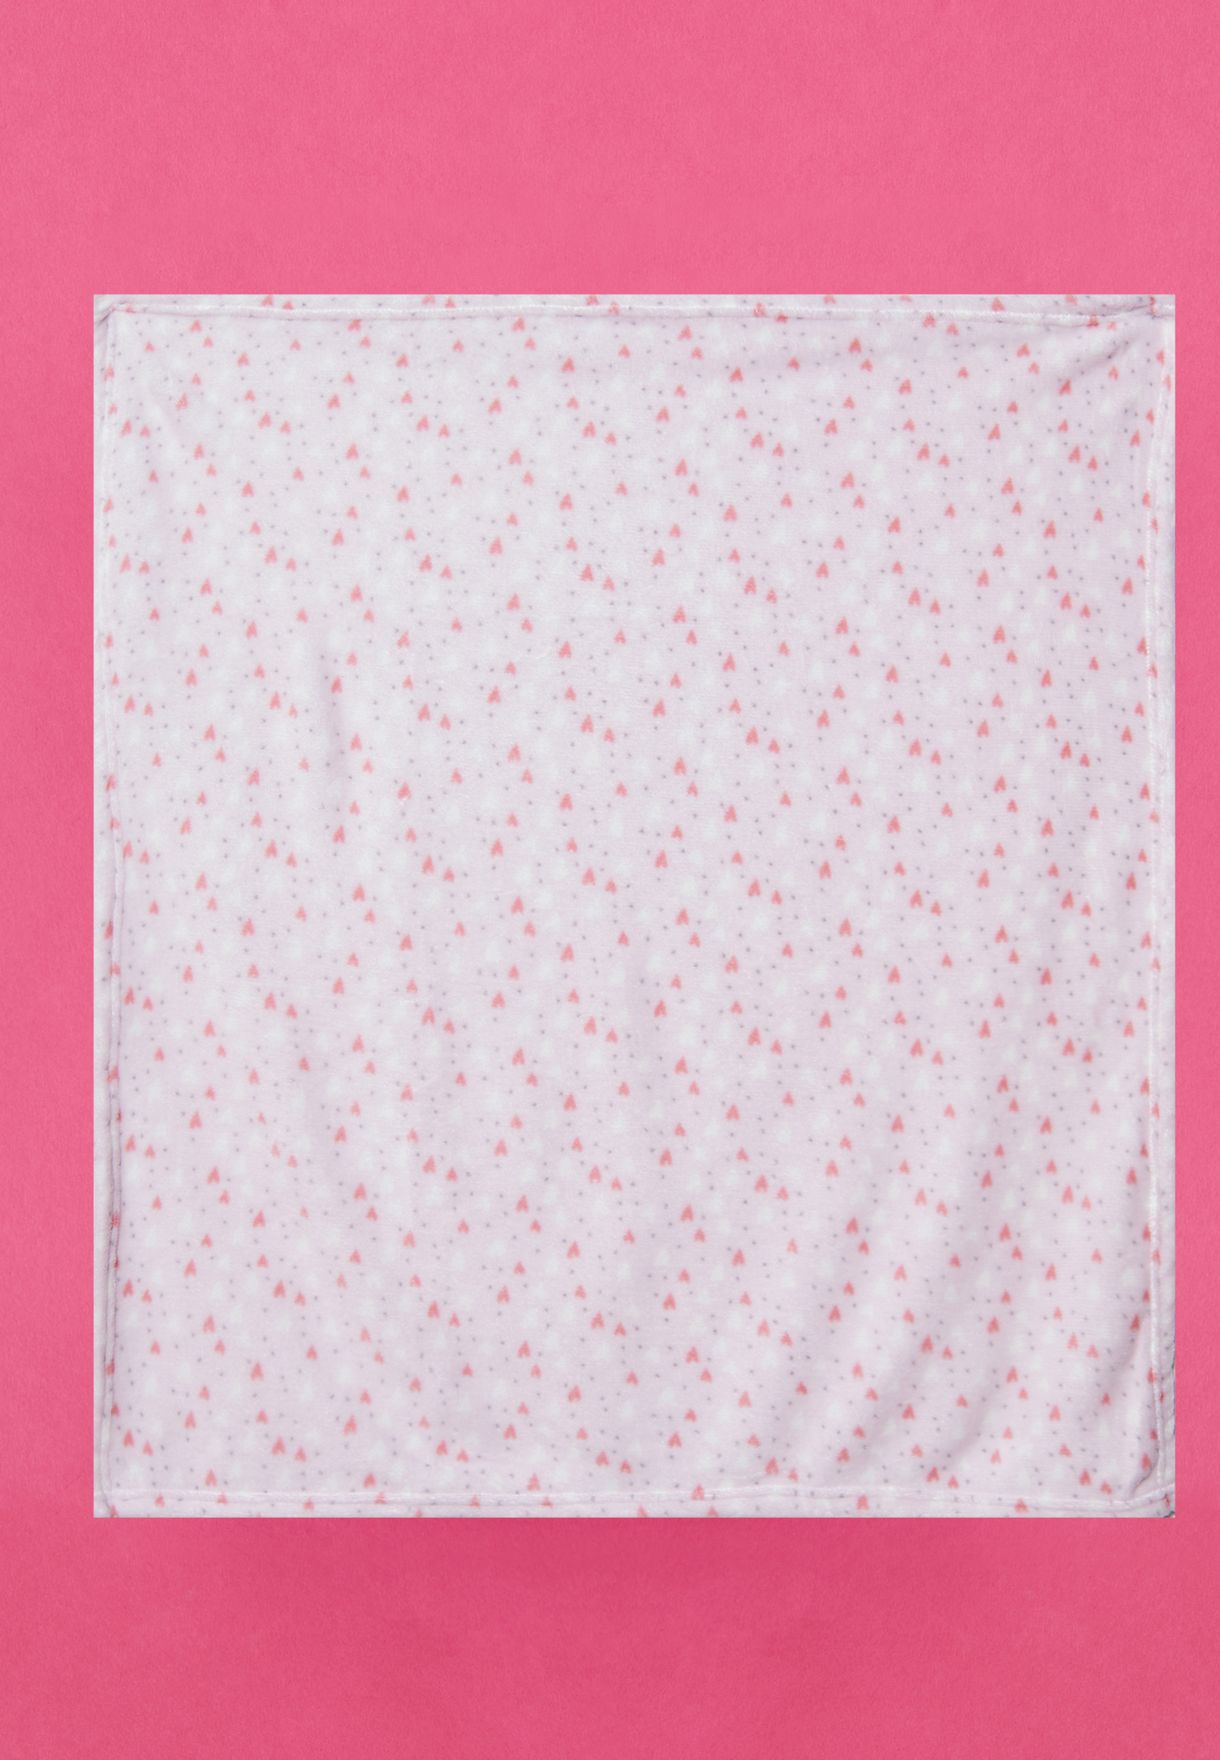 Bunny Comforter And Blanket